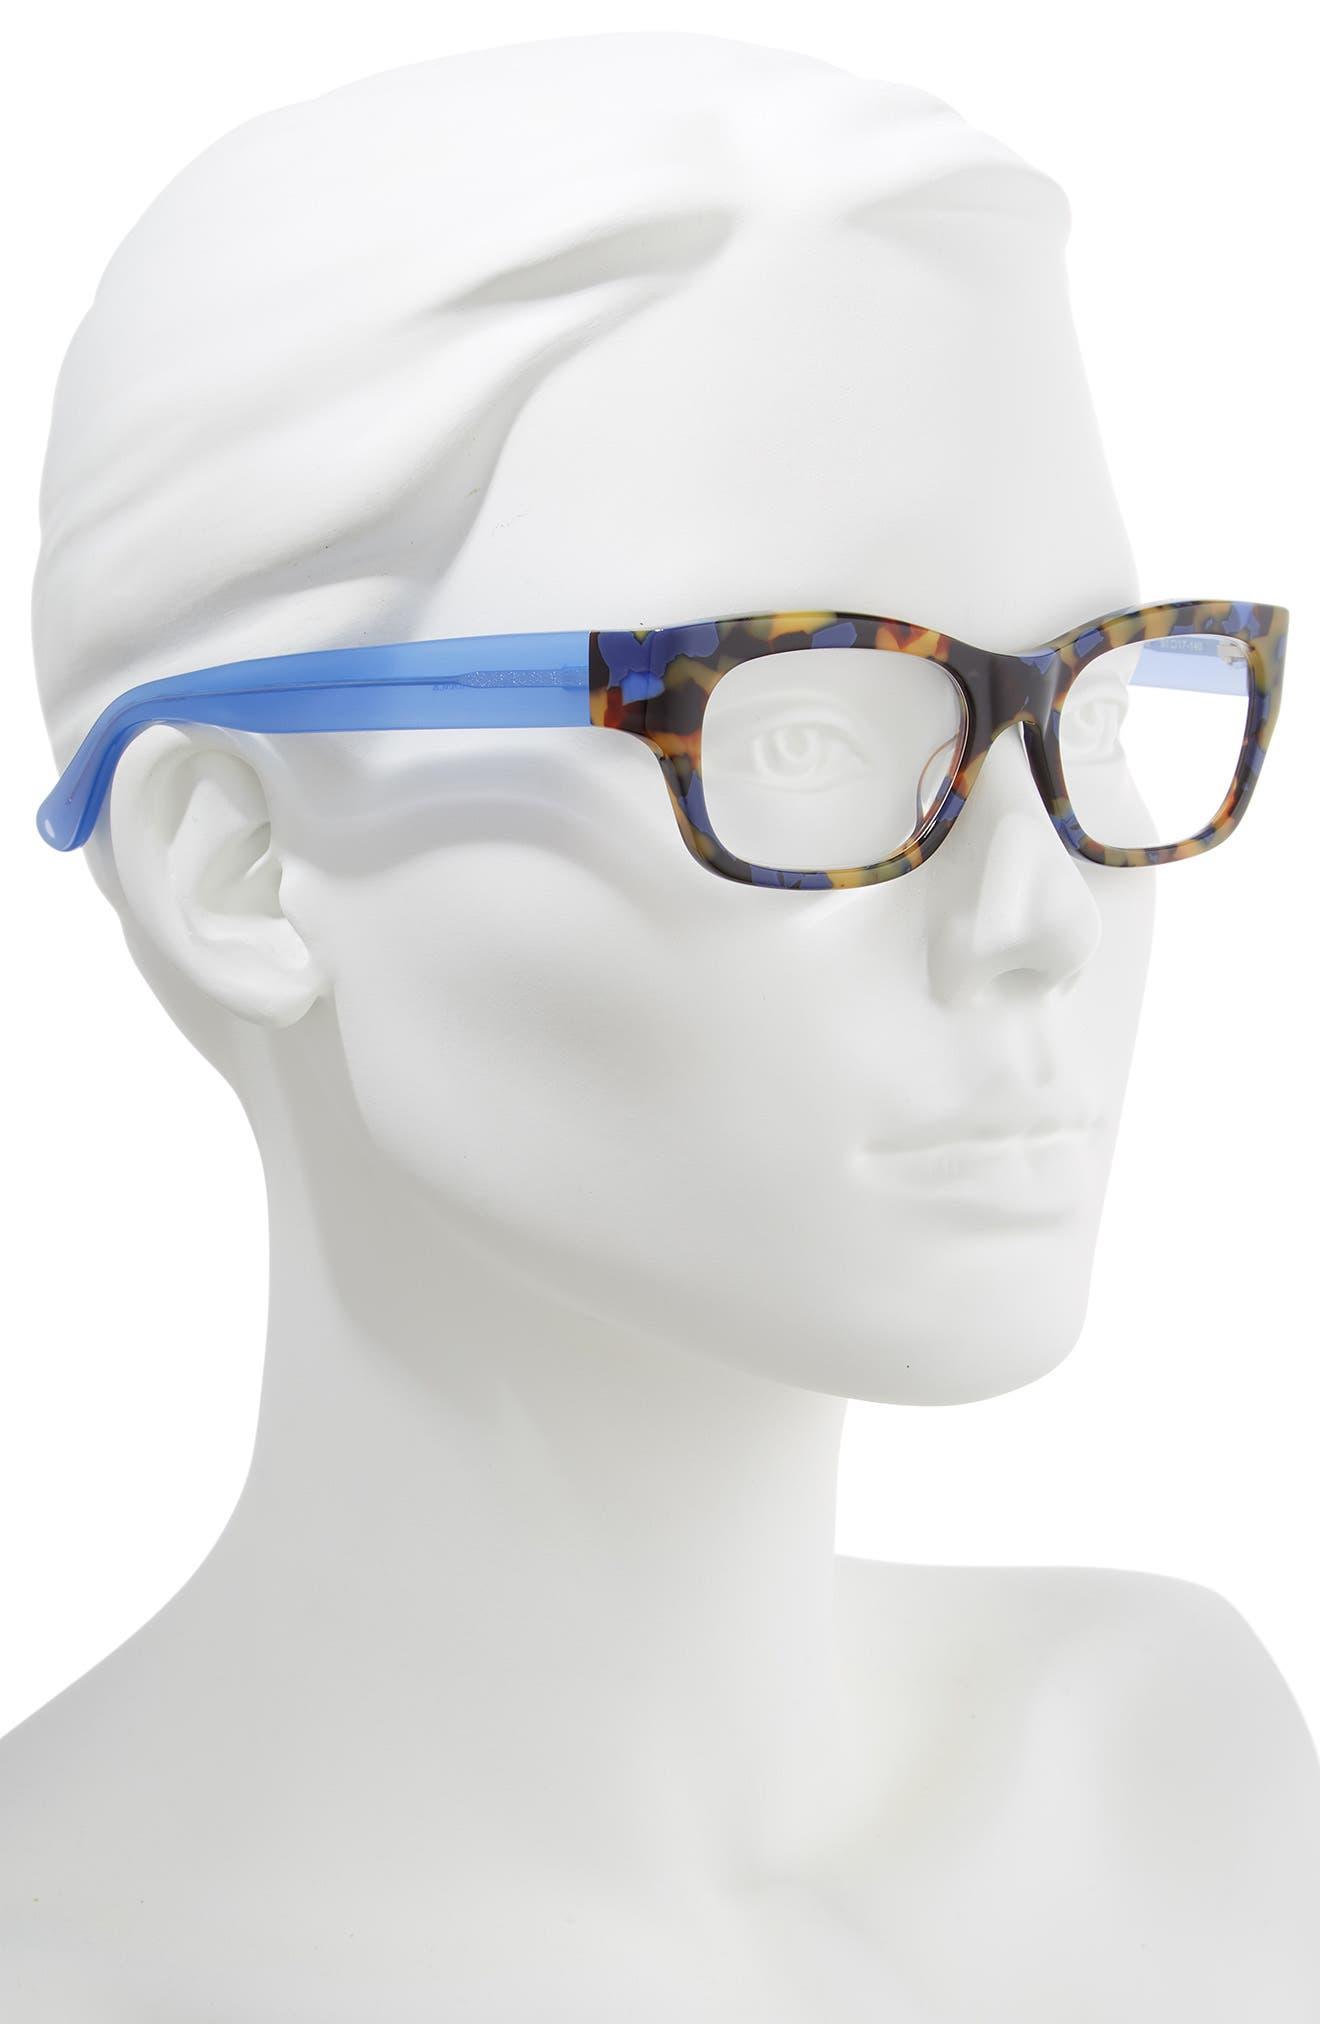 Suzy 51mm Reading Glasses,                             Alternate thumbnail 2, color,                             TORTOISE BLUE